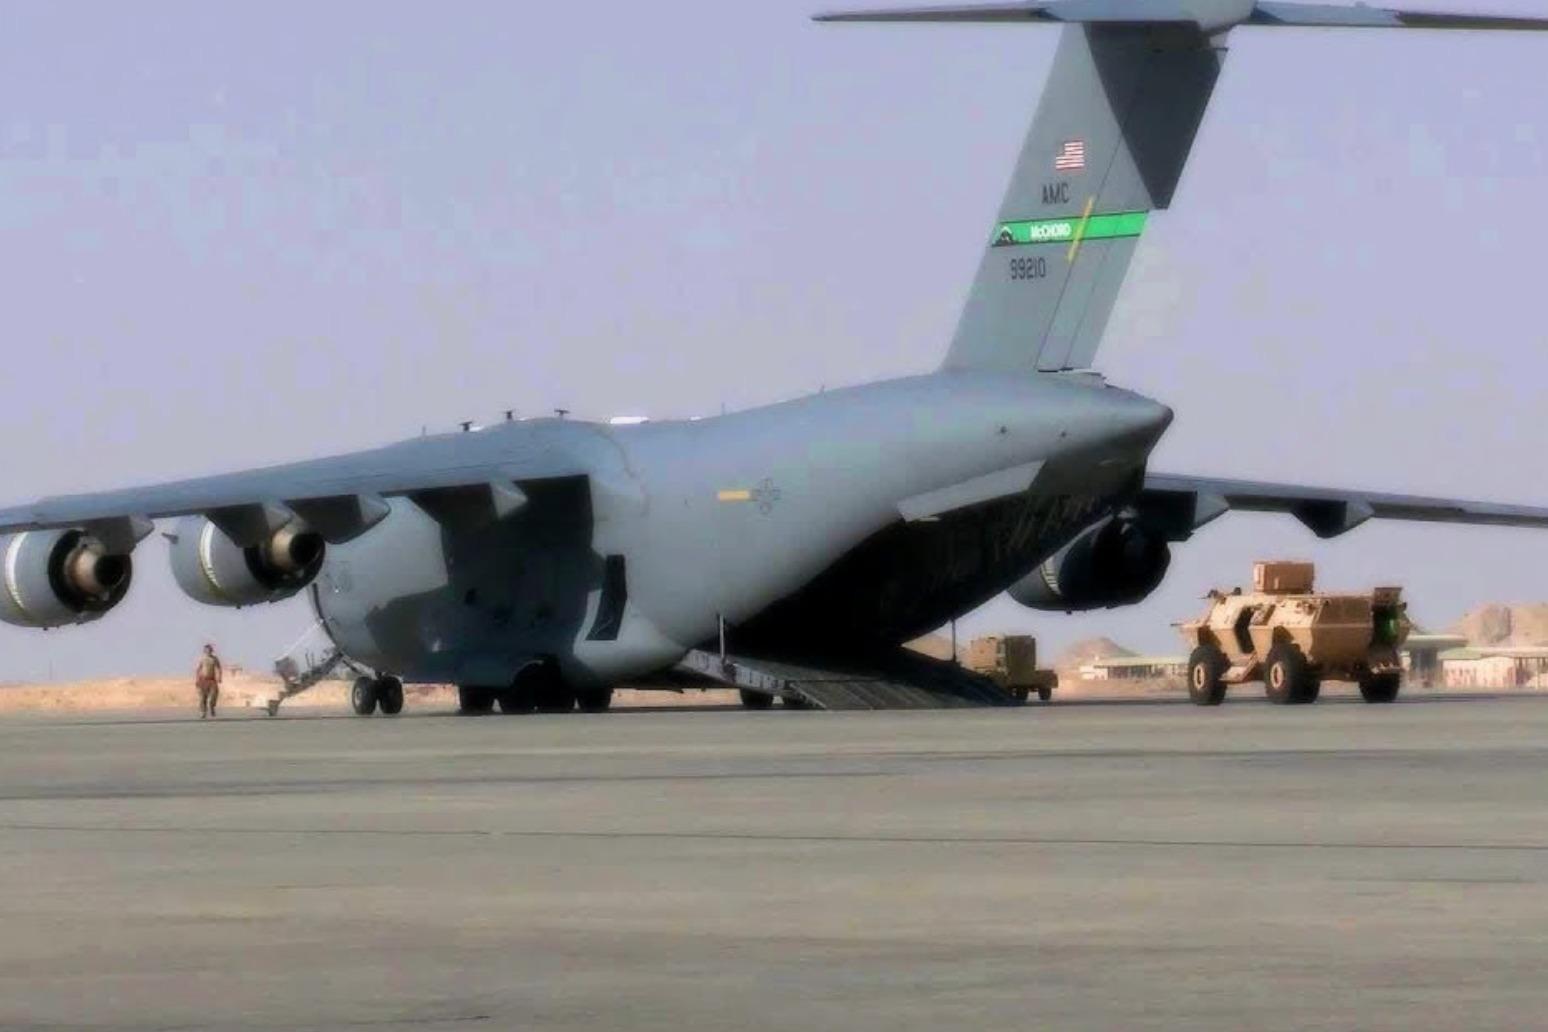 US 'has capacity to evacuate 300 Americans remaining in Afghanistan'